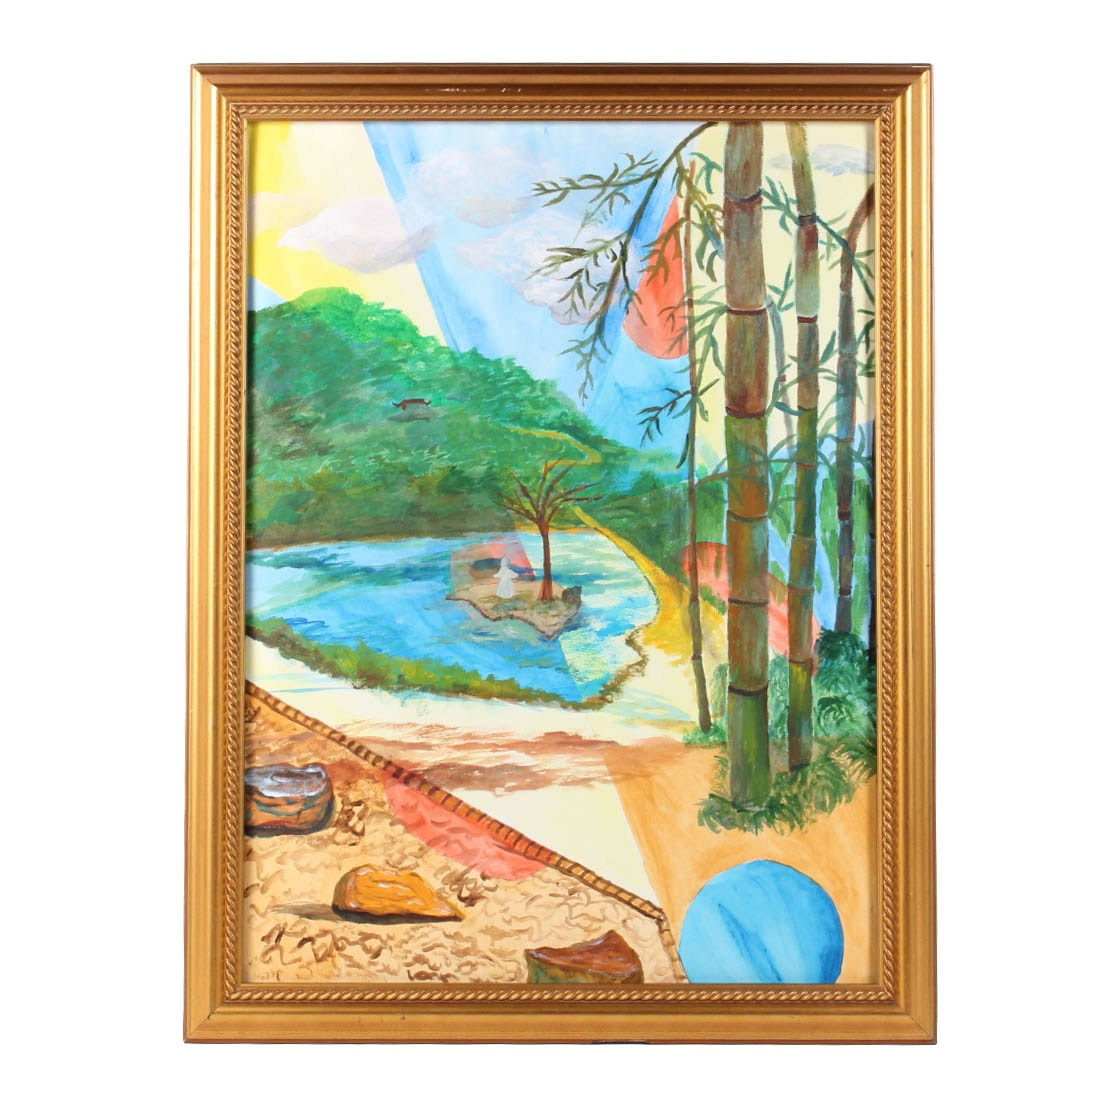 JWS Watercolor Painting